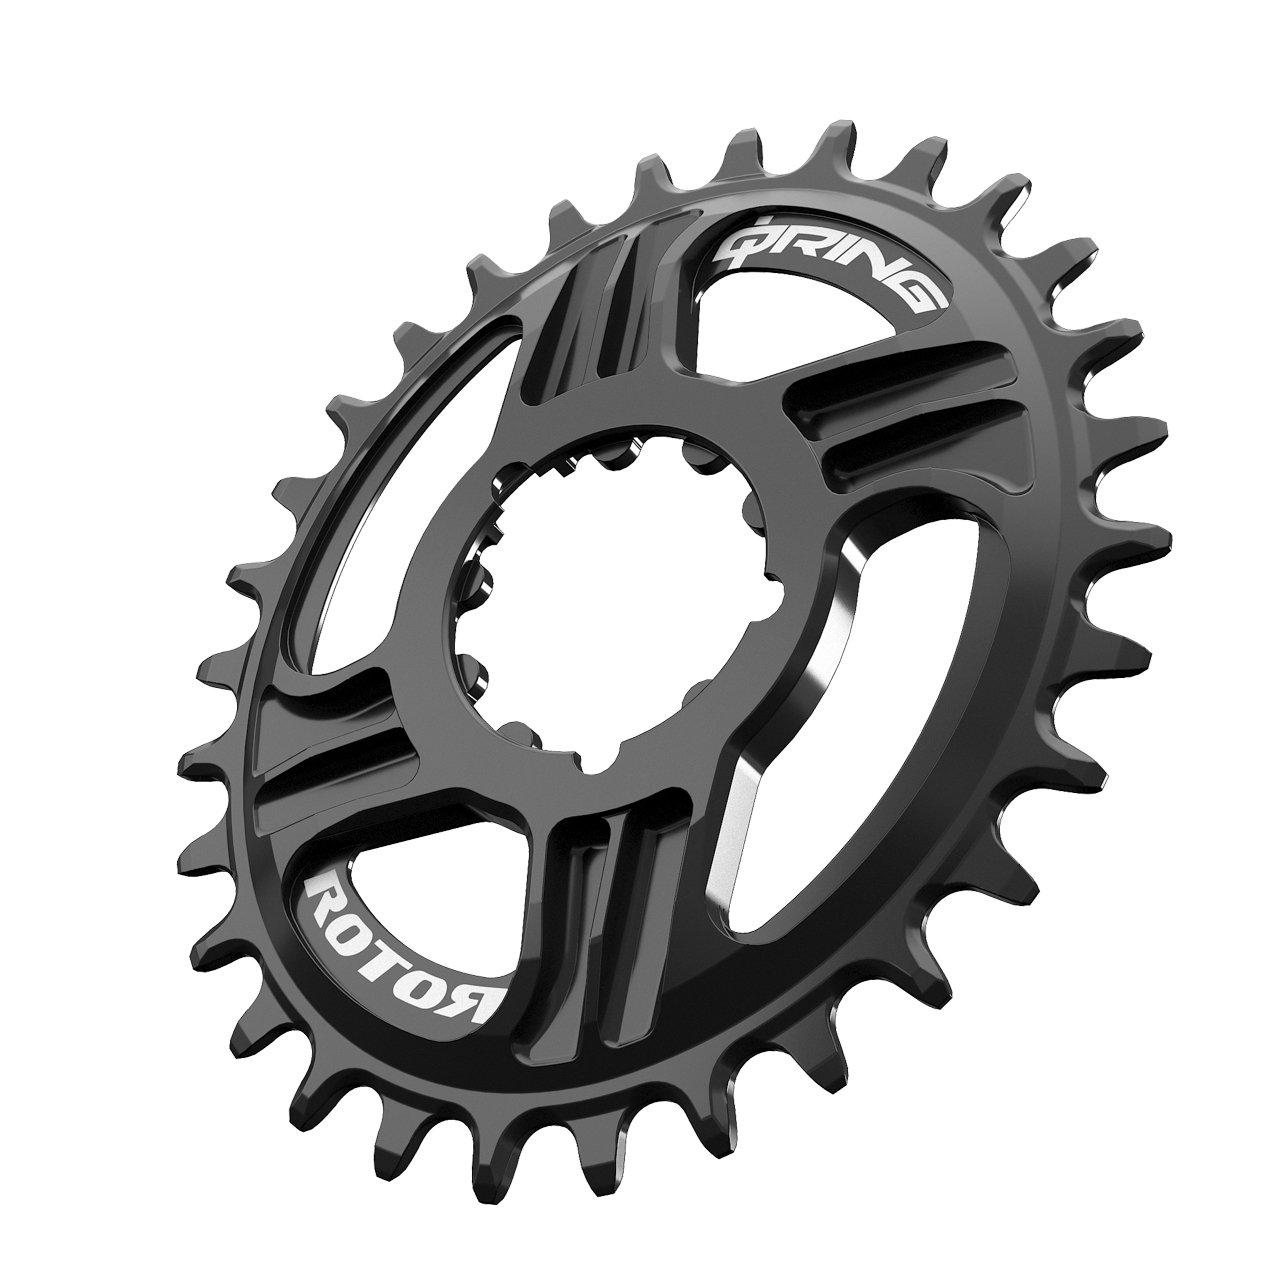 rotor Q Direct Mount Q Anillo de Dientes 34 Negro para SRAM GXP Montaje Directo